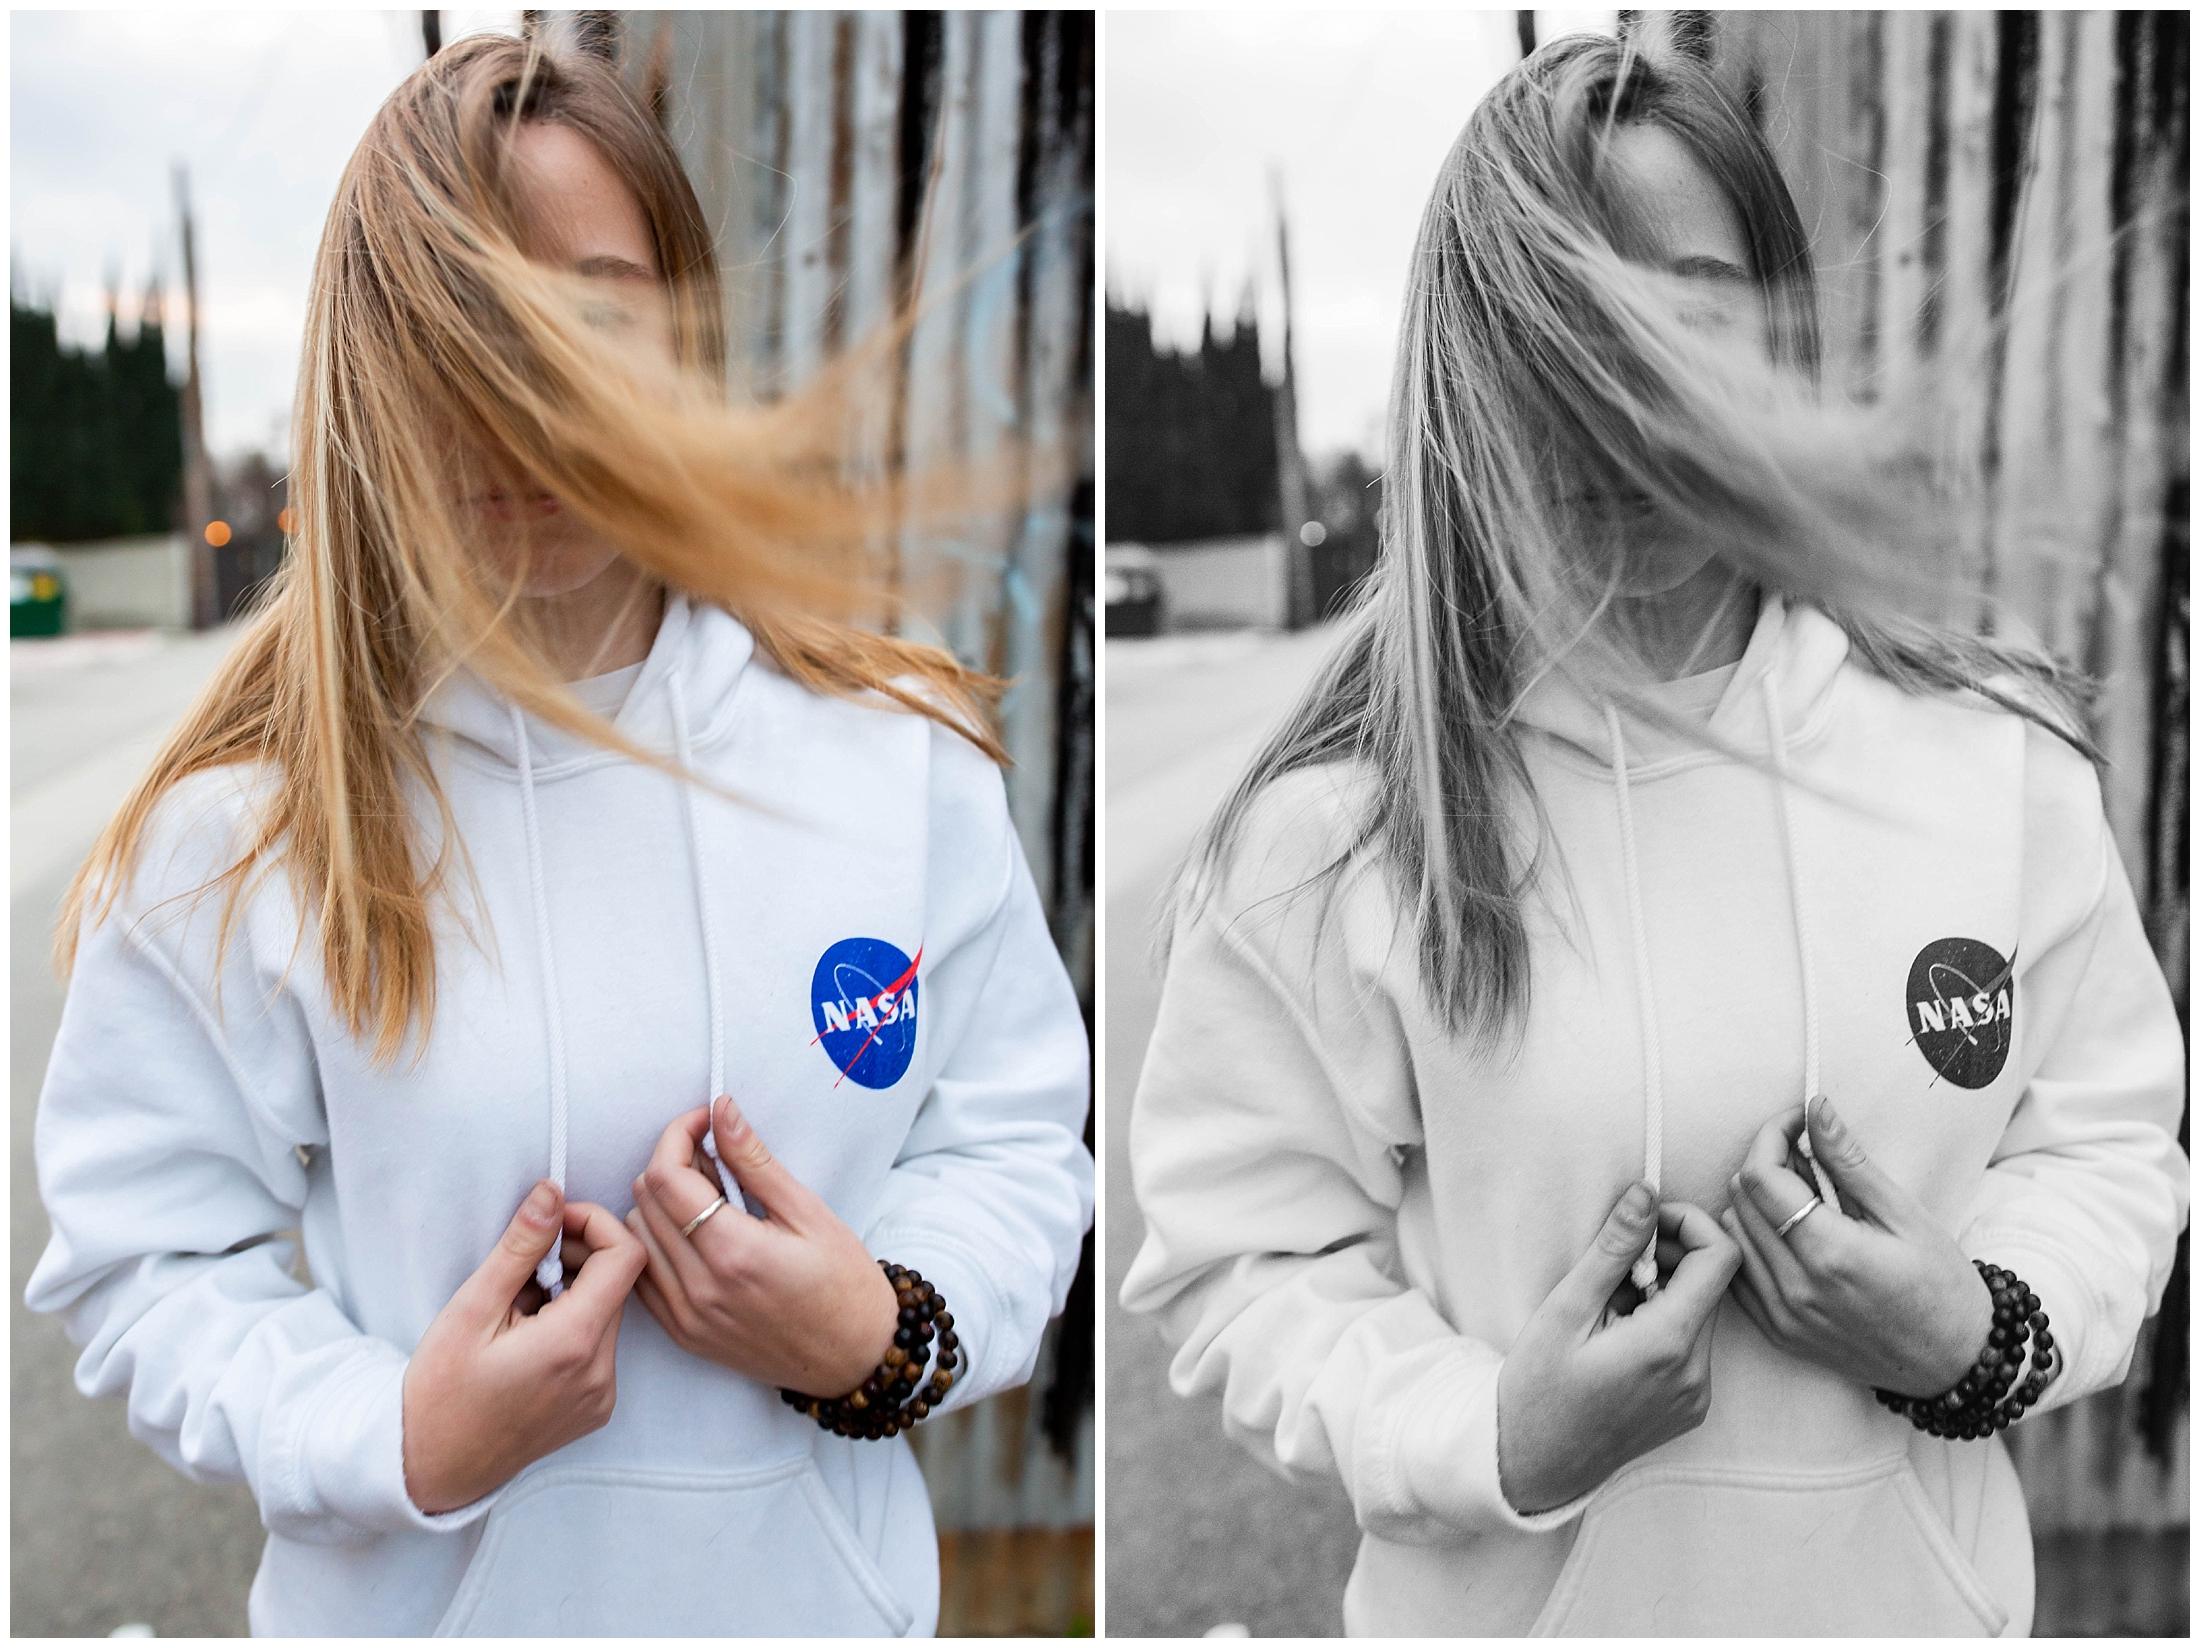 Nasa creative photoshoot astrology astroscience